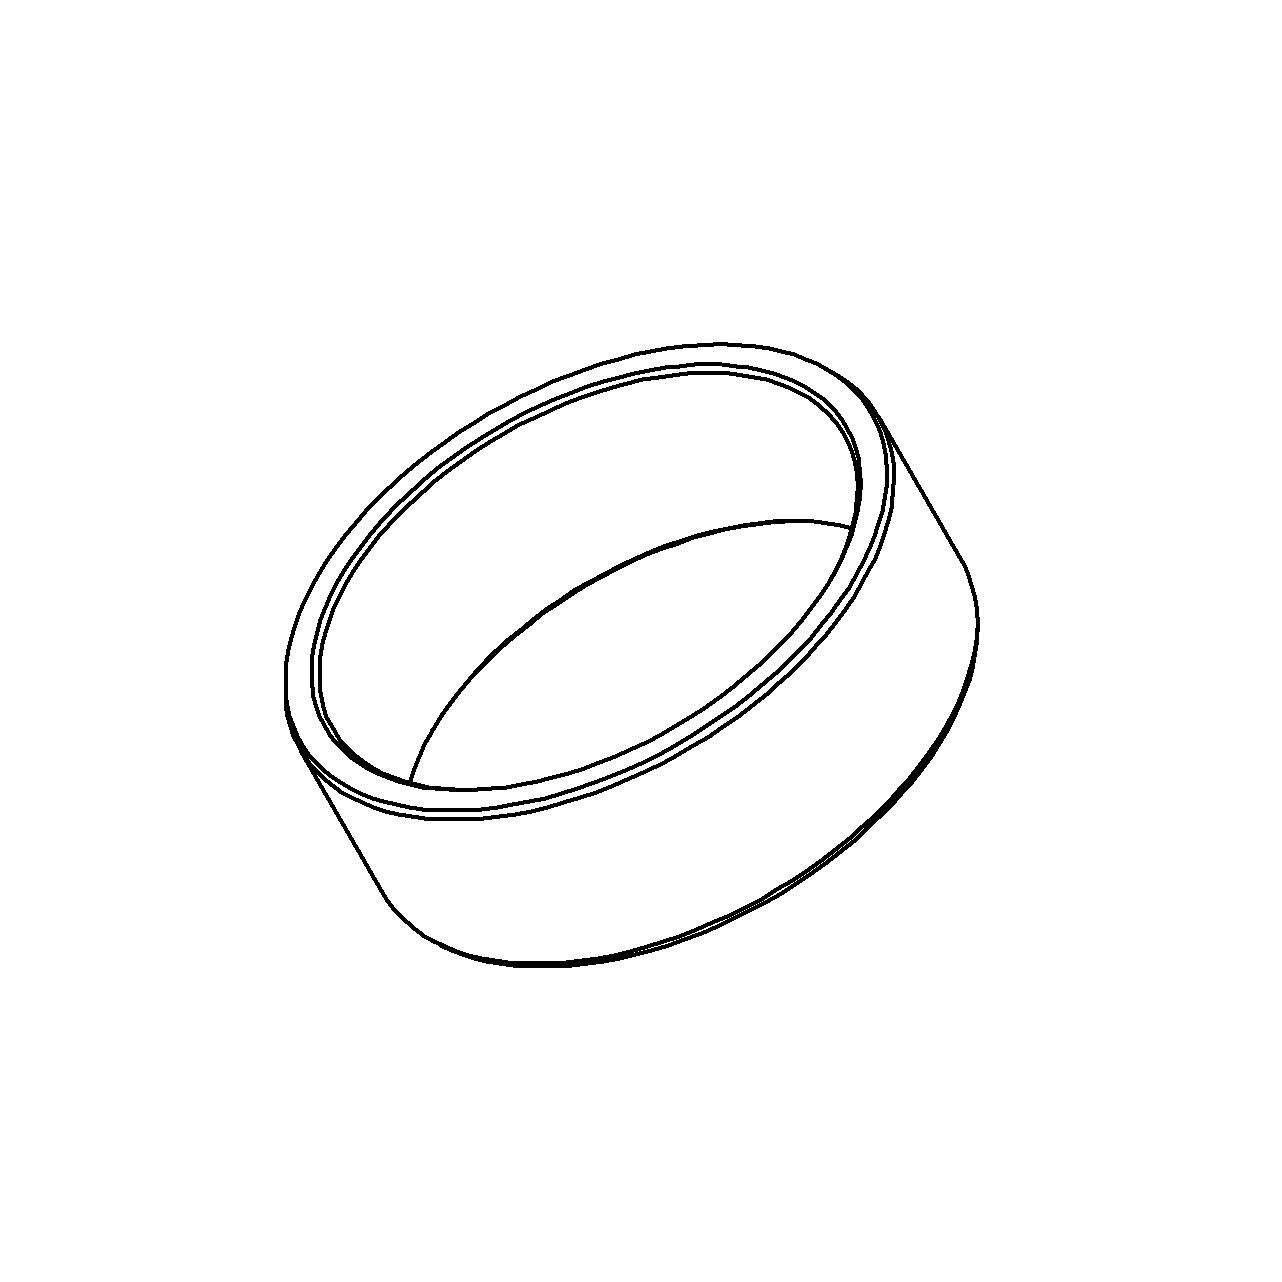 L17466